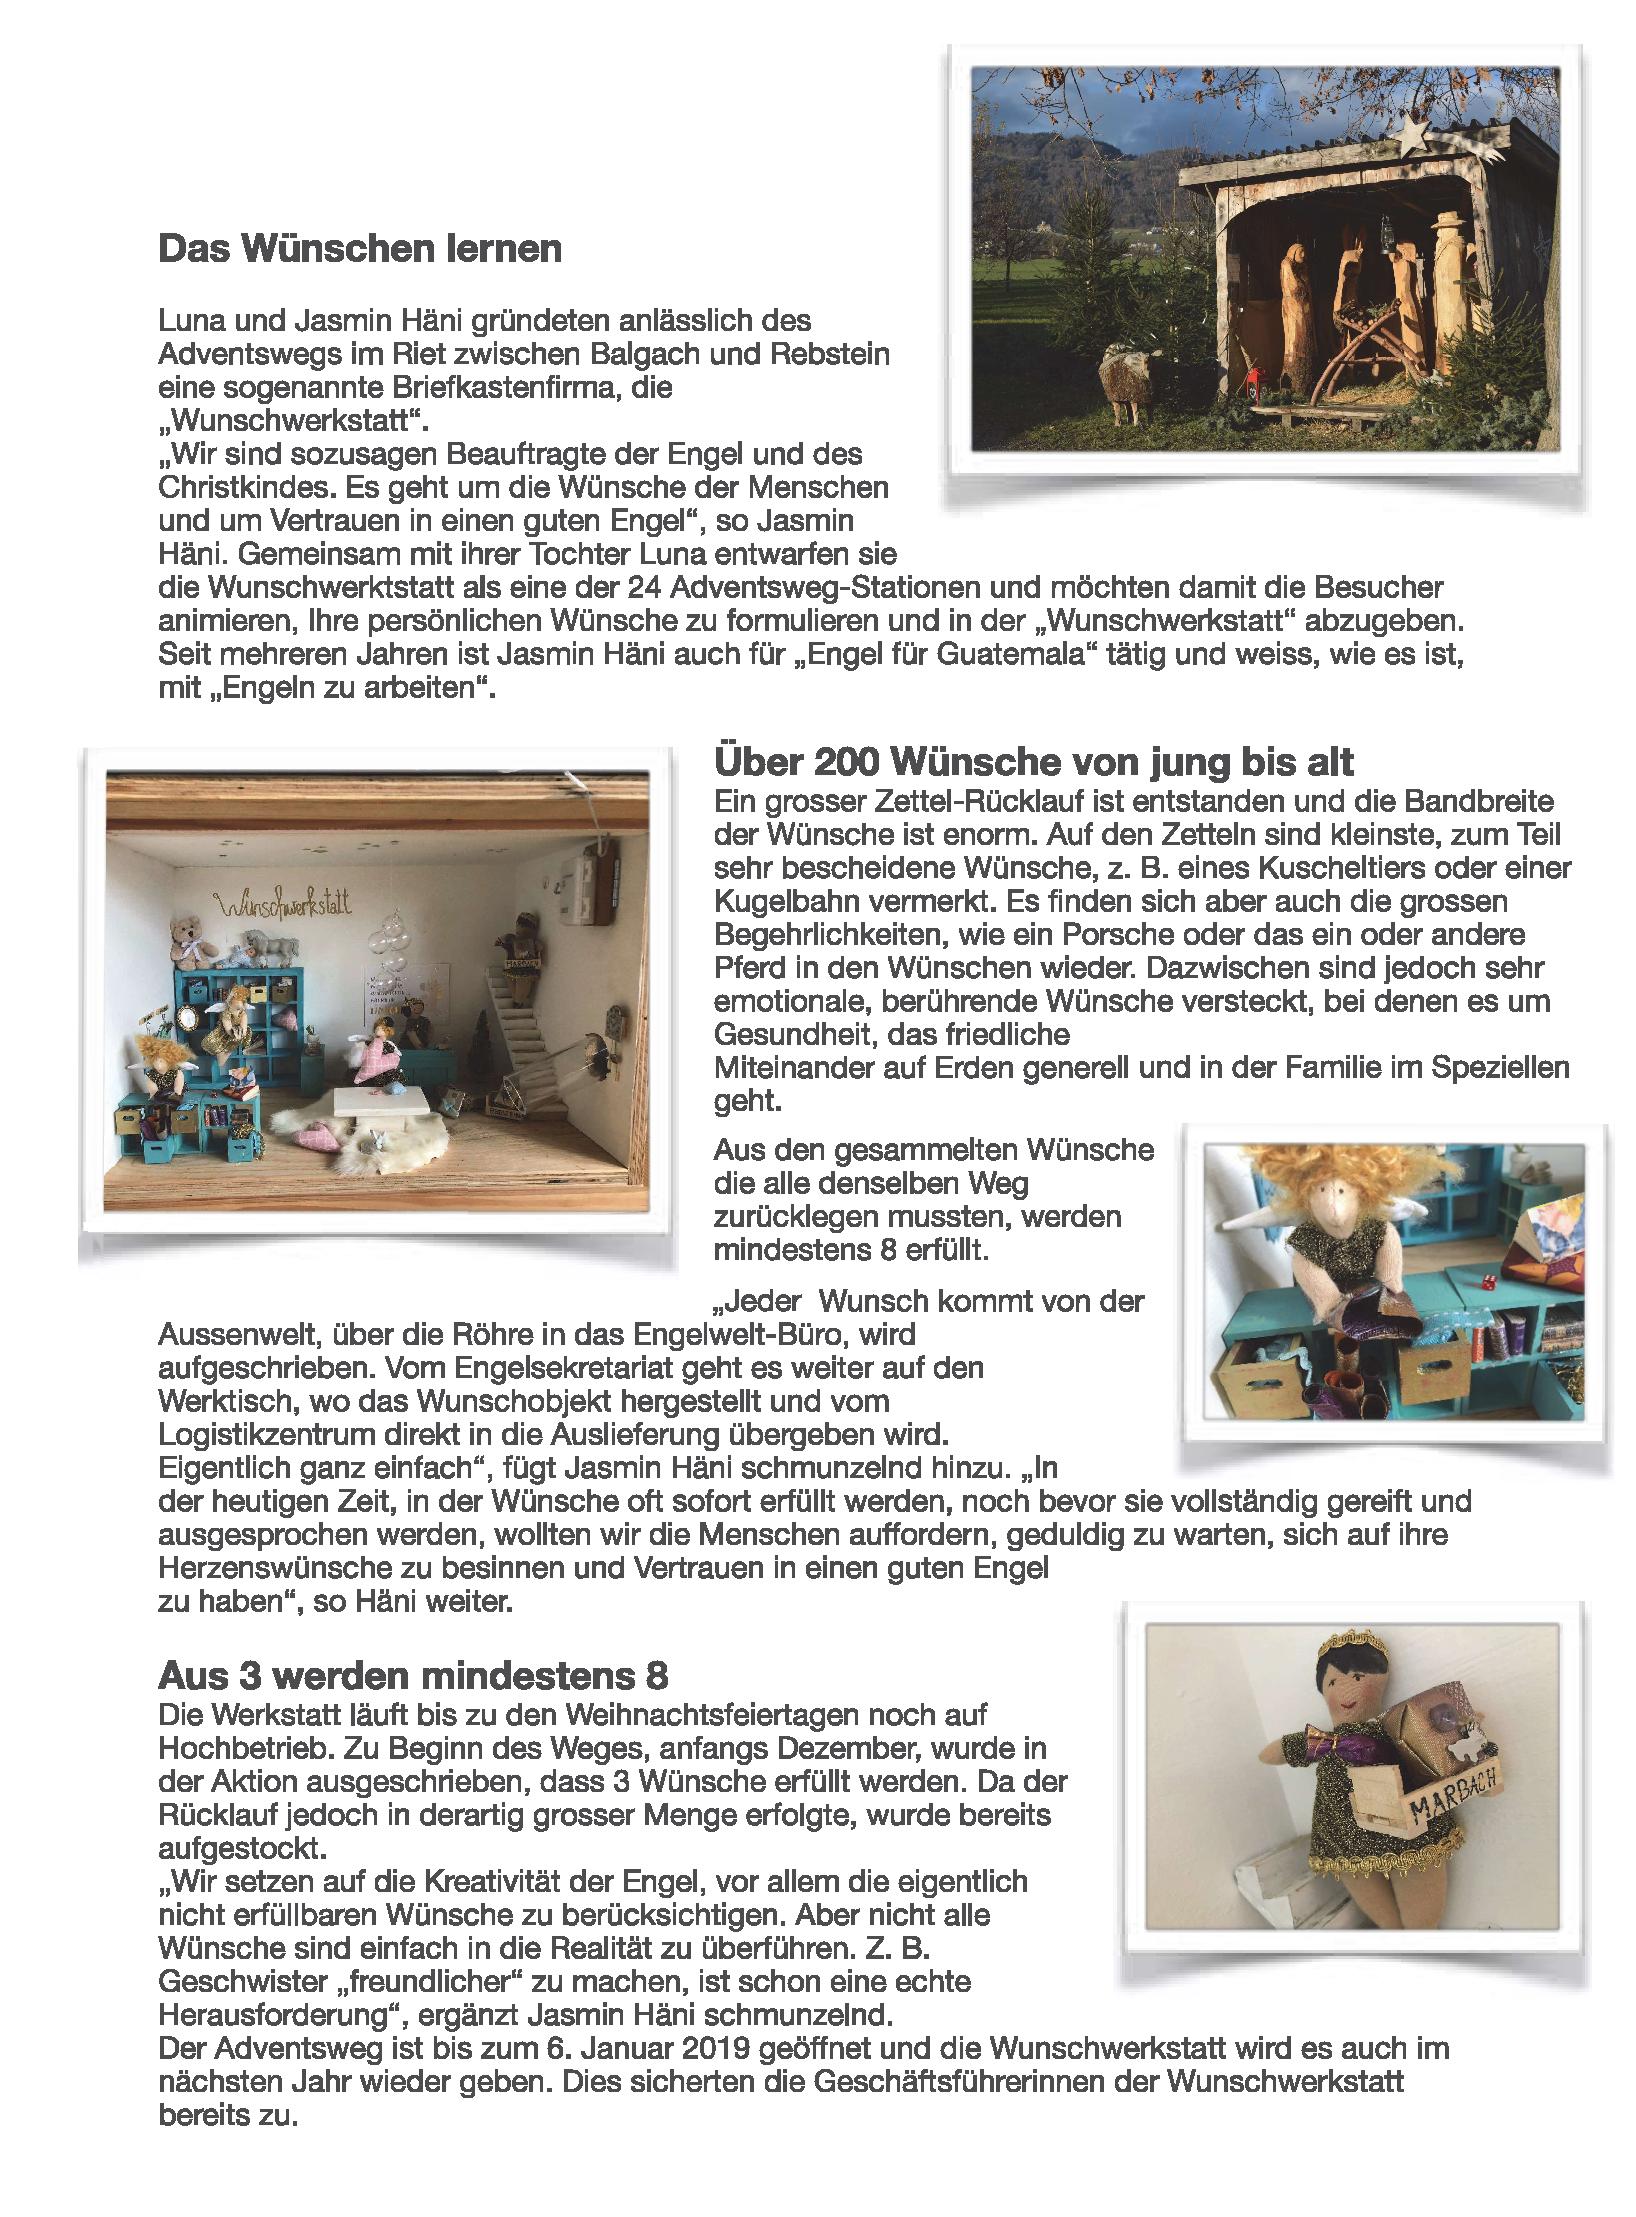 2018-12-20 Adventsweg Wunschwerkstattpng